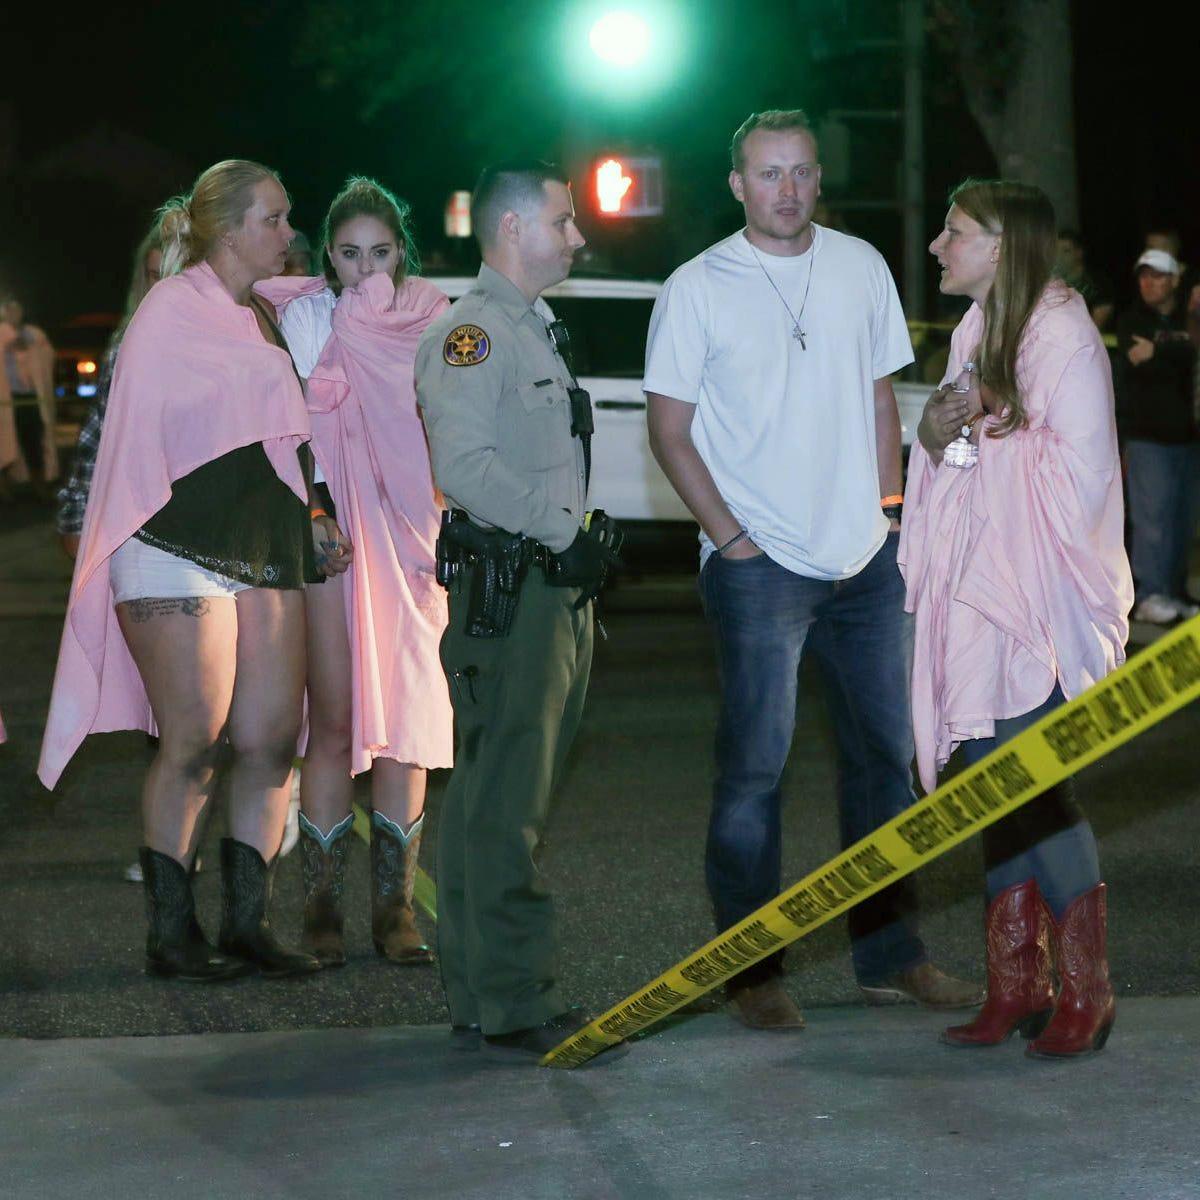 LeBron James, Britney Spears, Ellen DeGeneres and other celebrities react to Thousand Oaks shooting